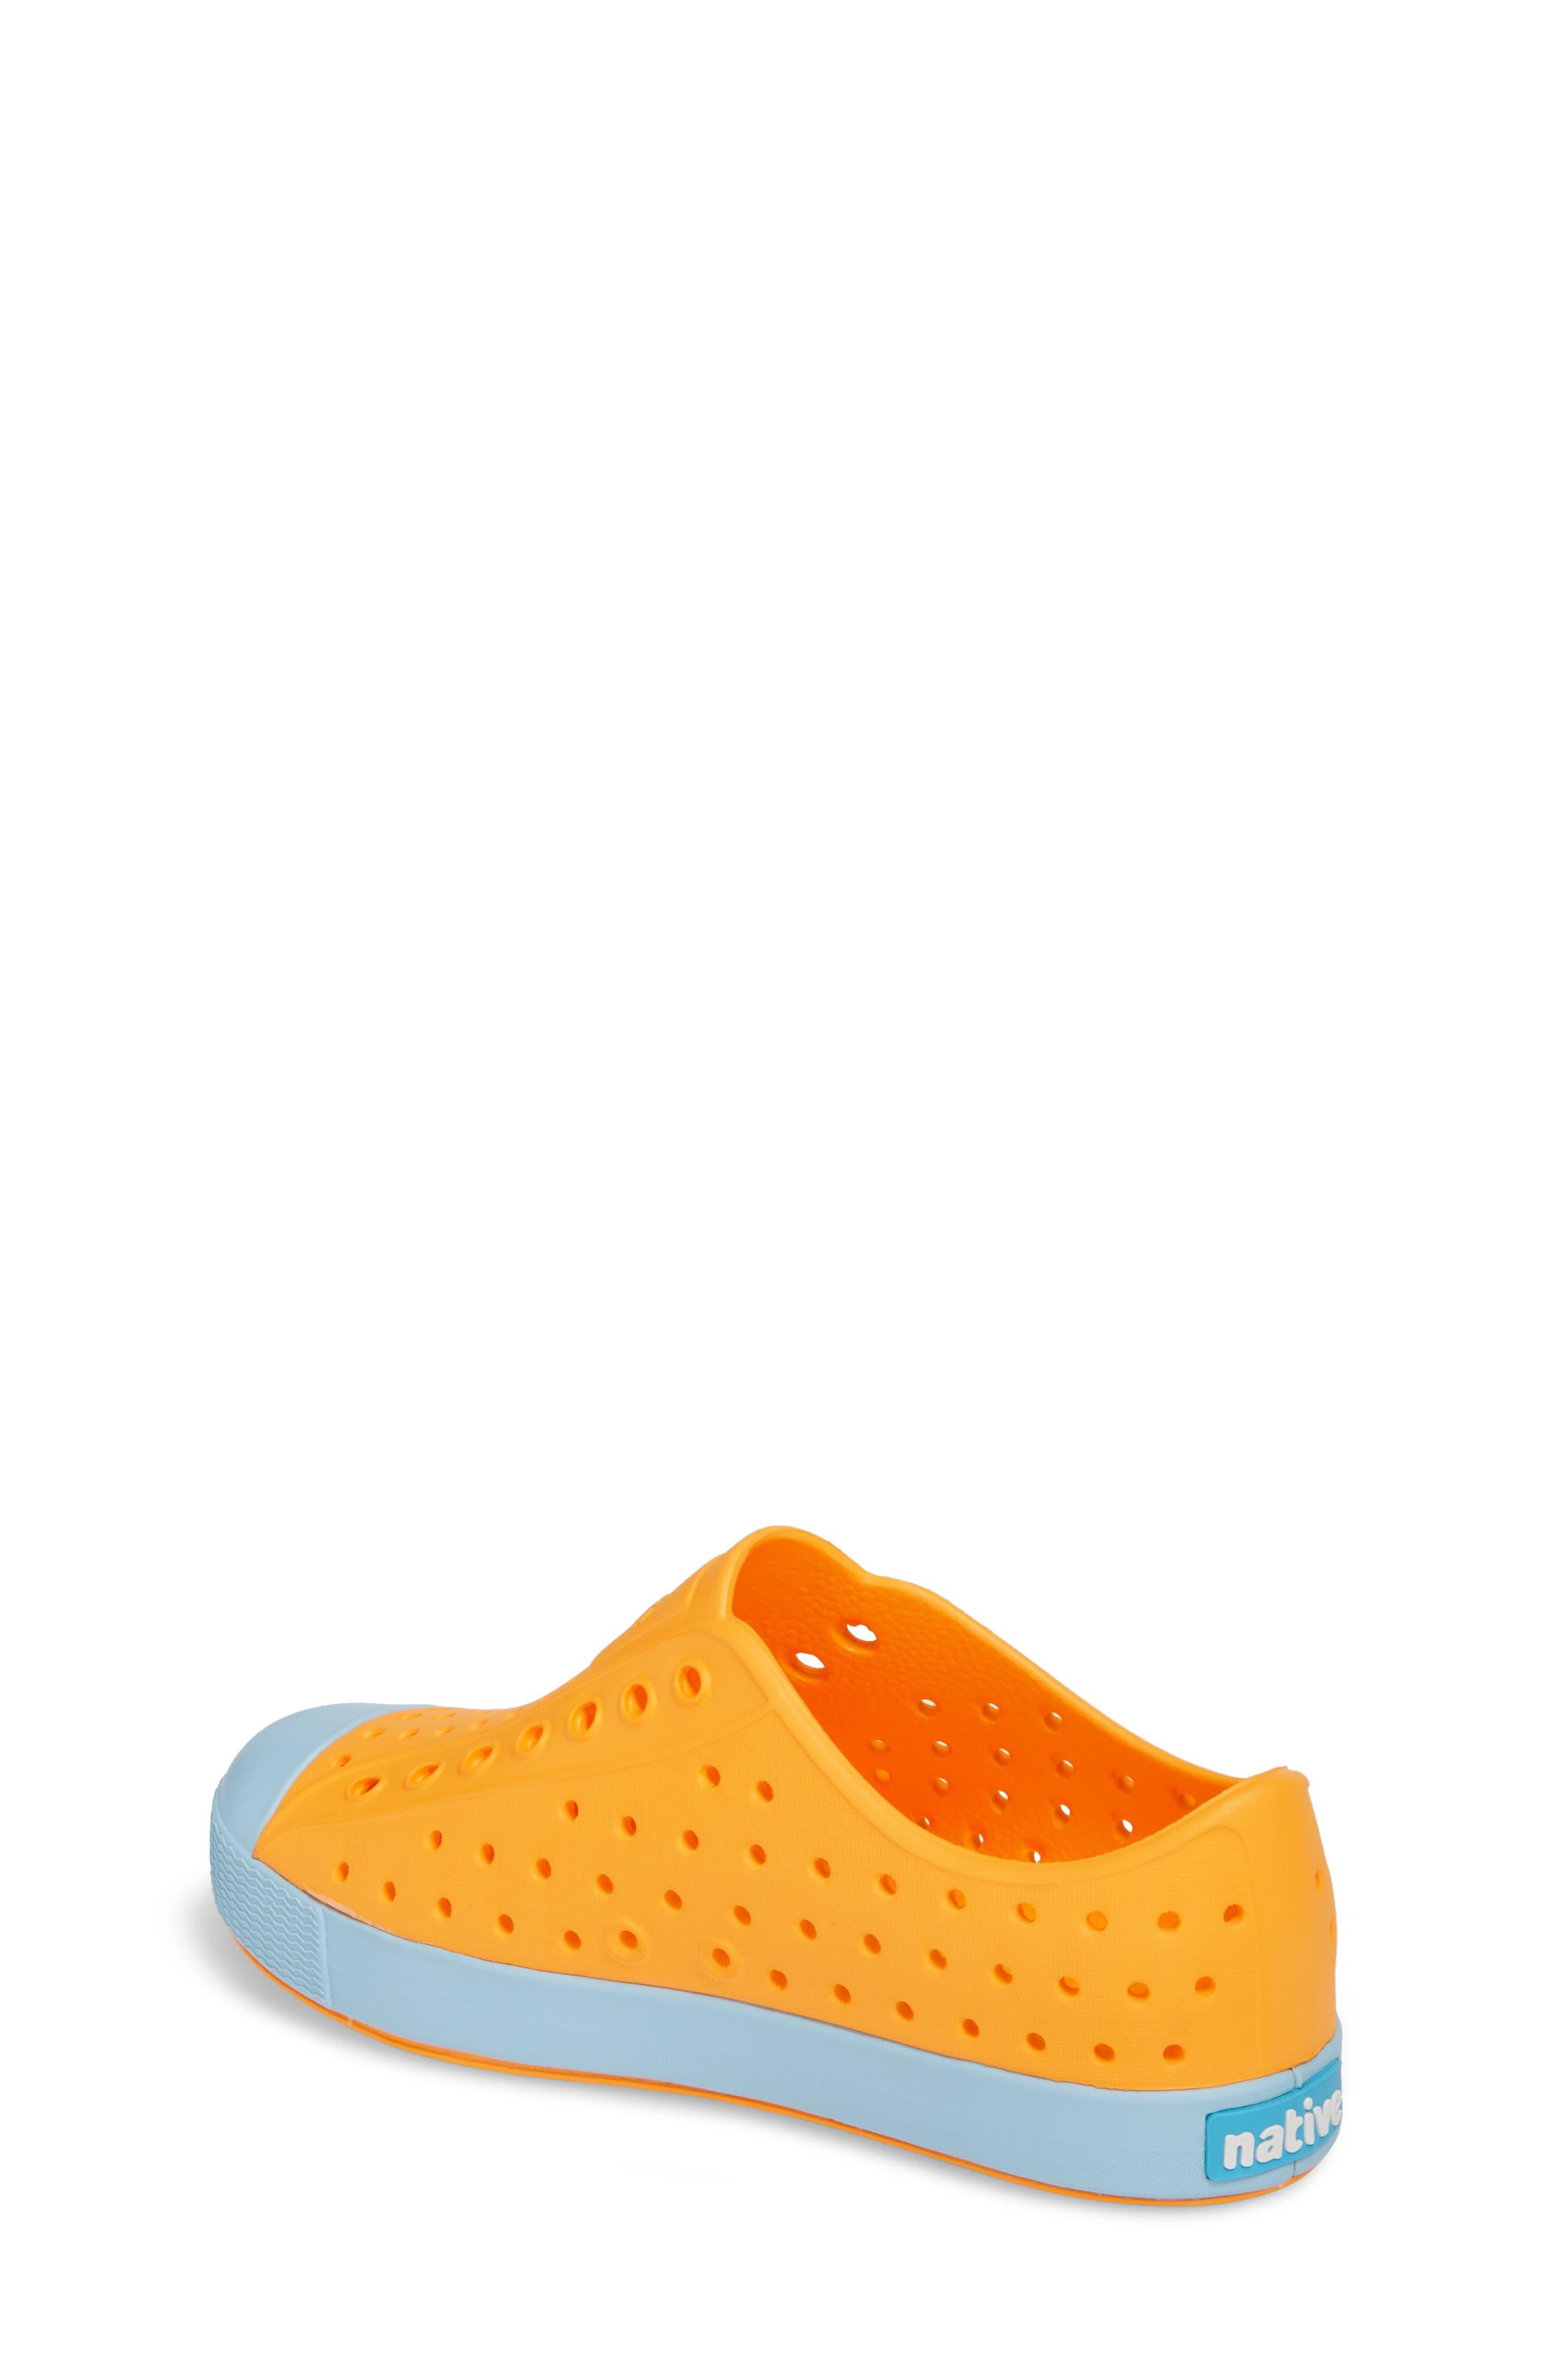 'Jefferson' Water Friendly Slip-On Sneaker,                             Alternate thumbnail 83, color,